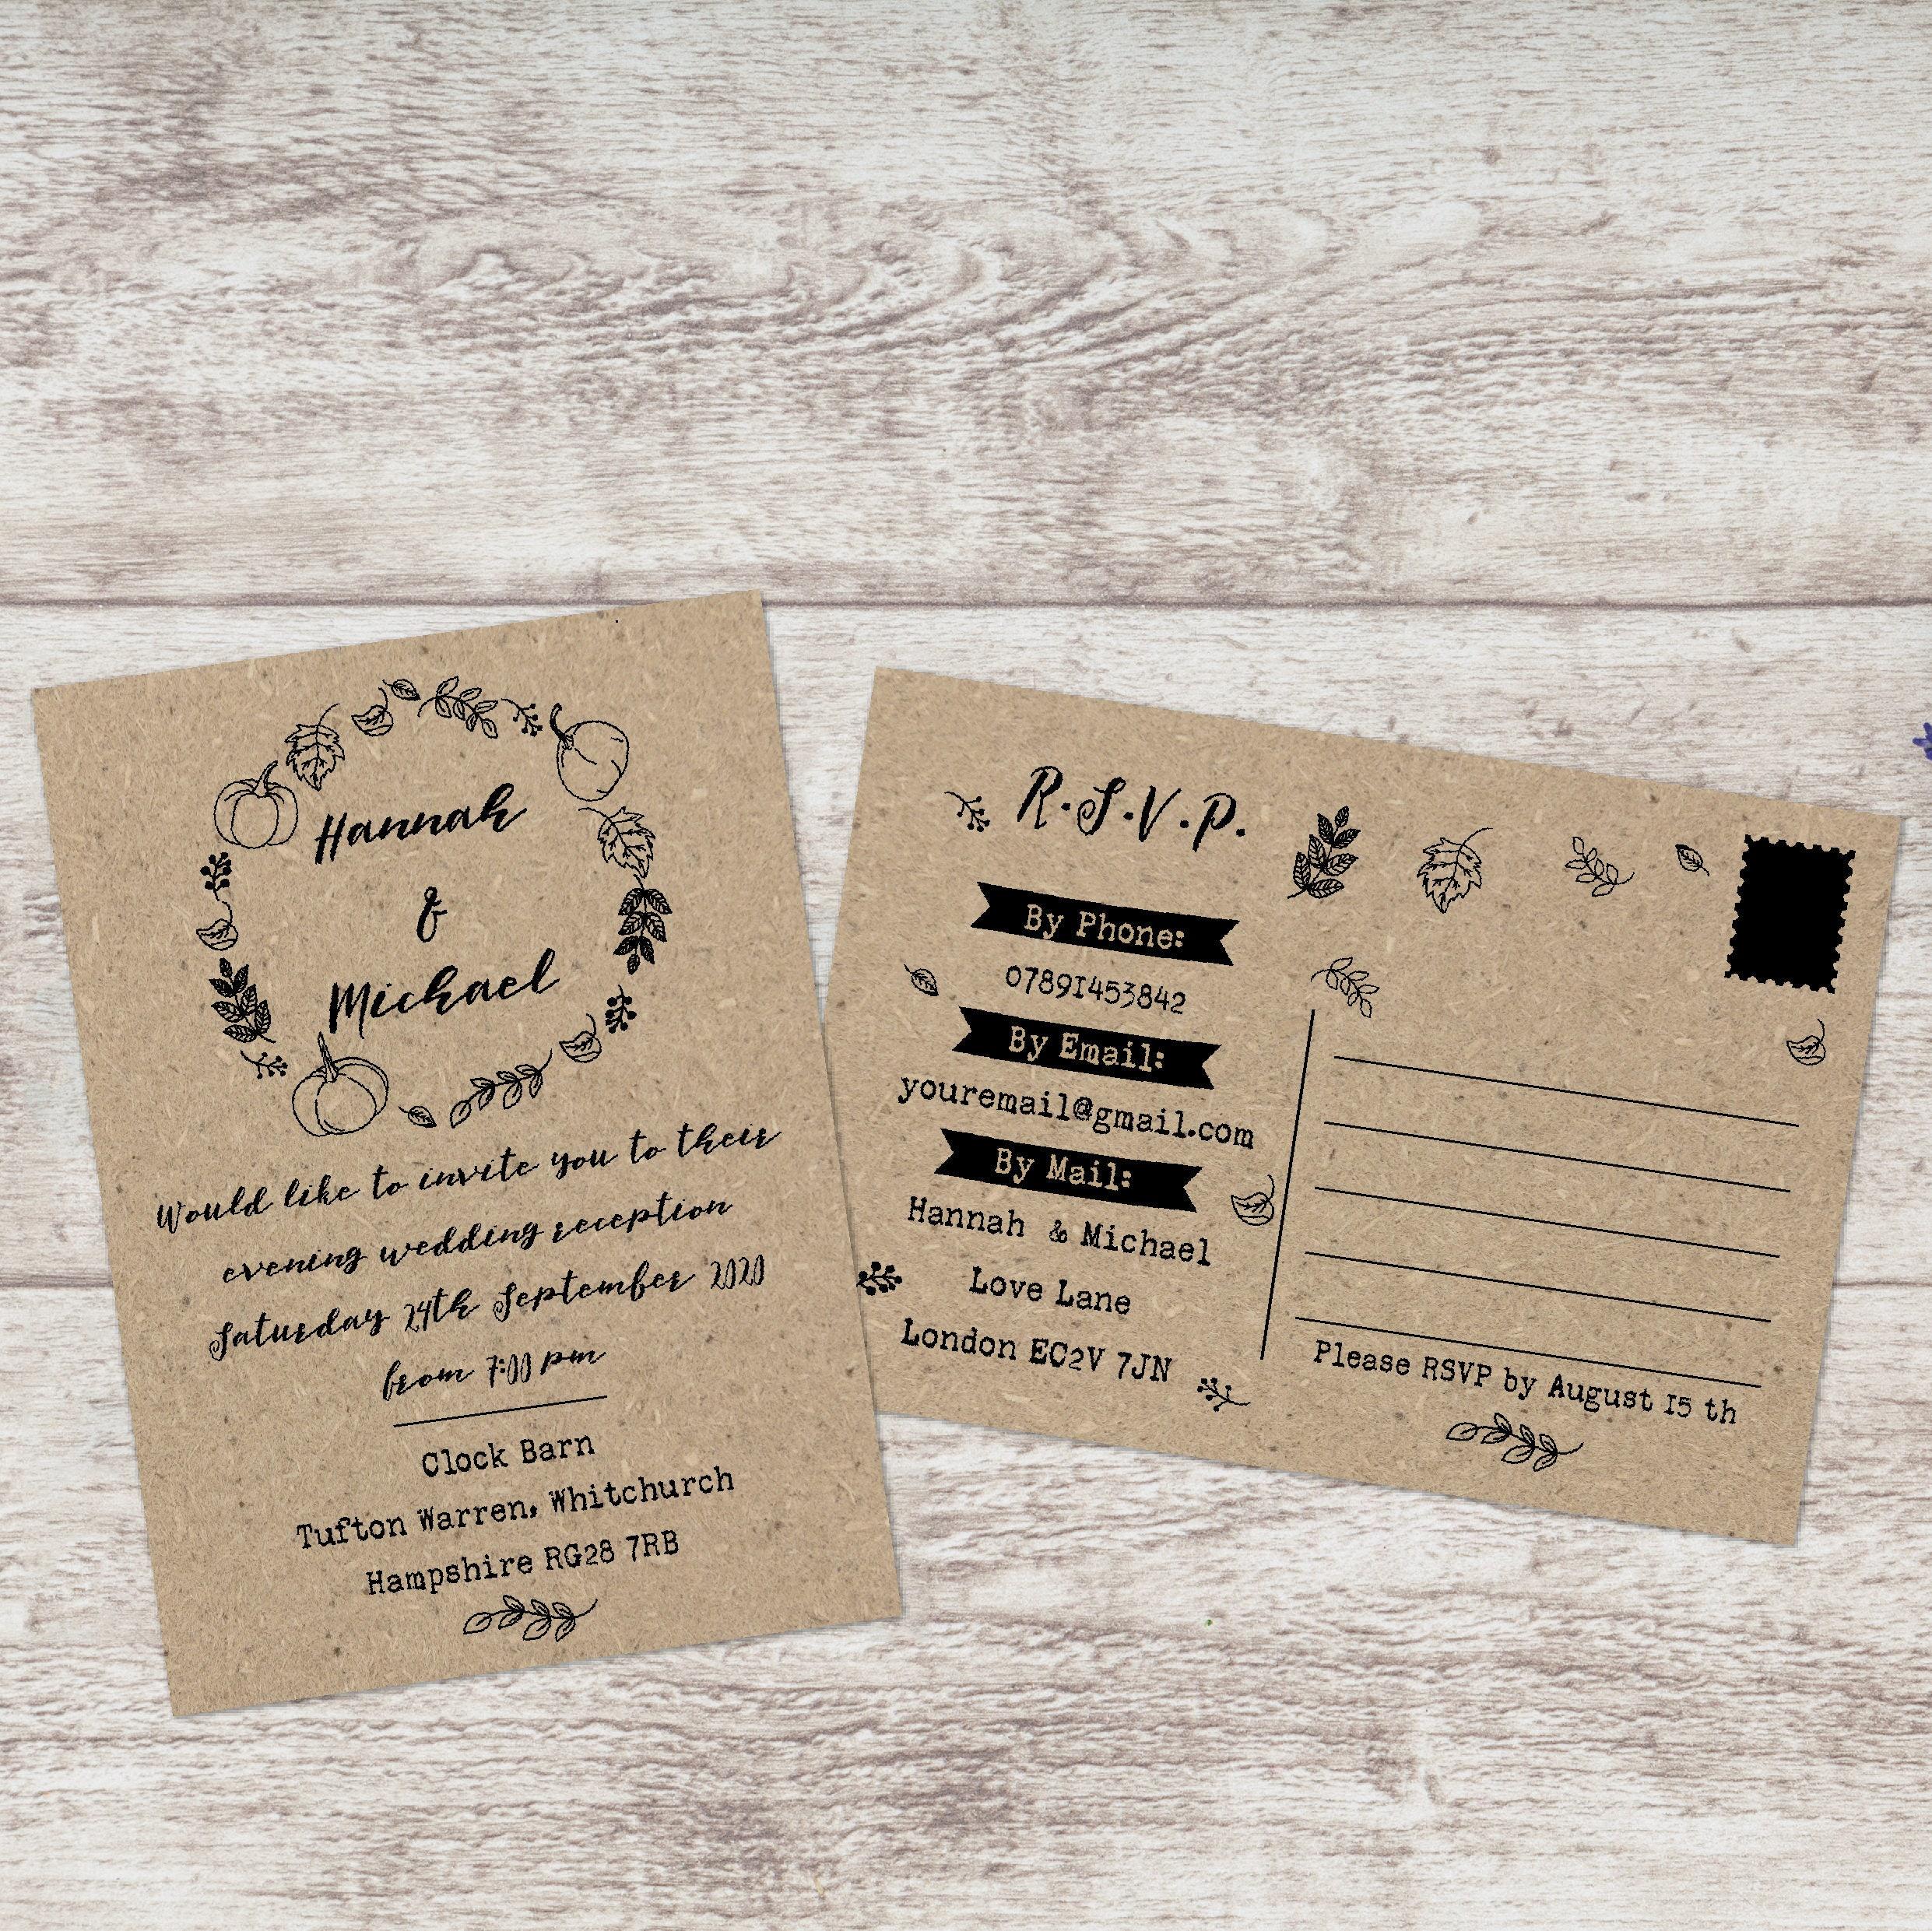 Fall Wedding Invitations With RSVP, Postcard Wedding Invitations And RSVP,  Wedding Reception Invites, Vintage Postcard Wedding Invitation A6